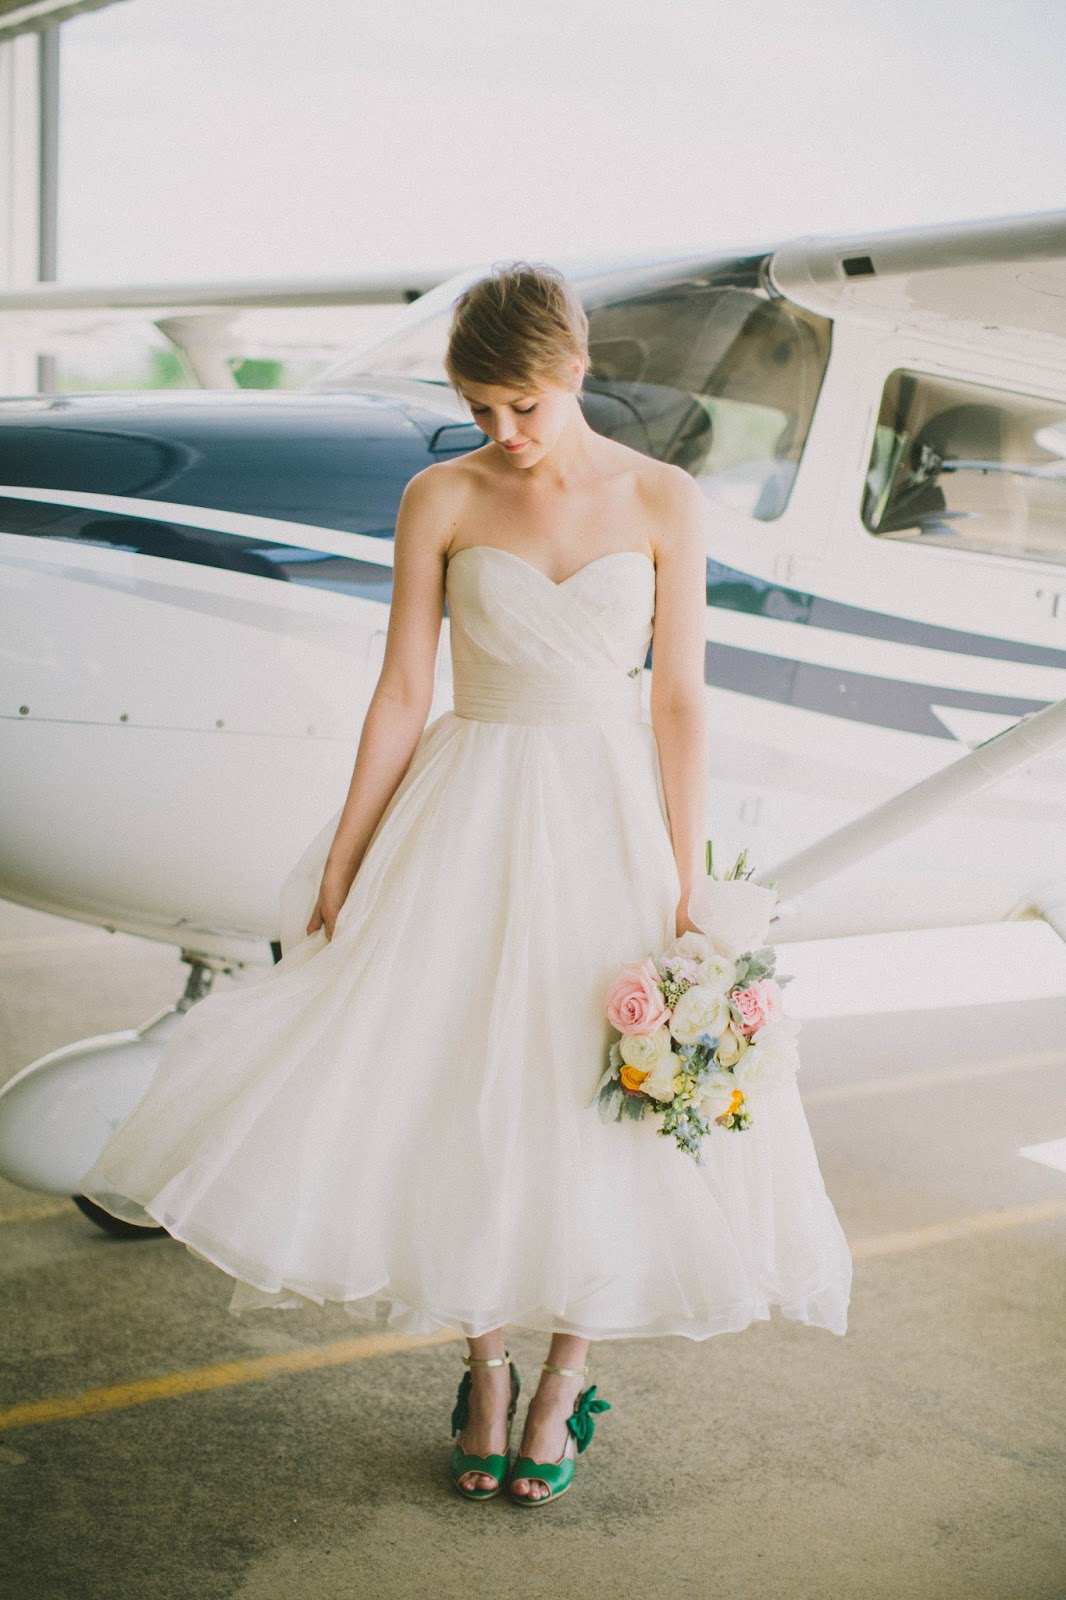 Perfect little wedding